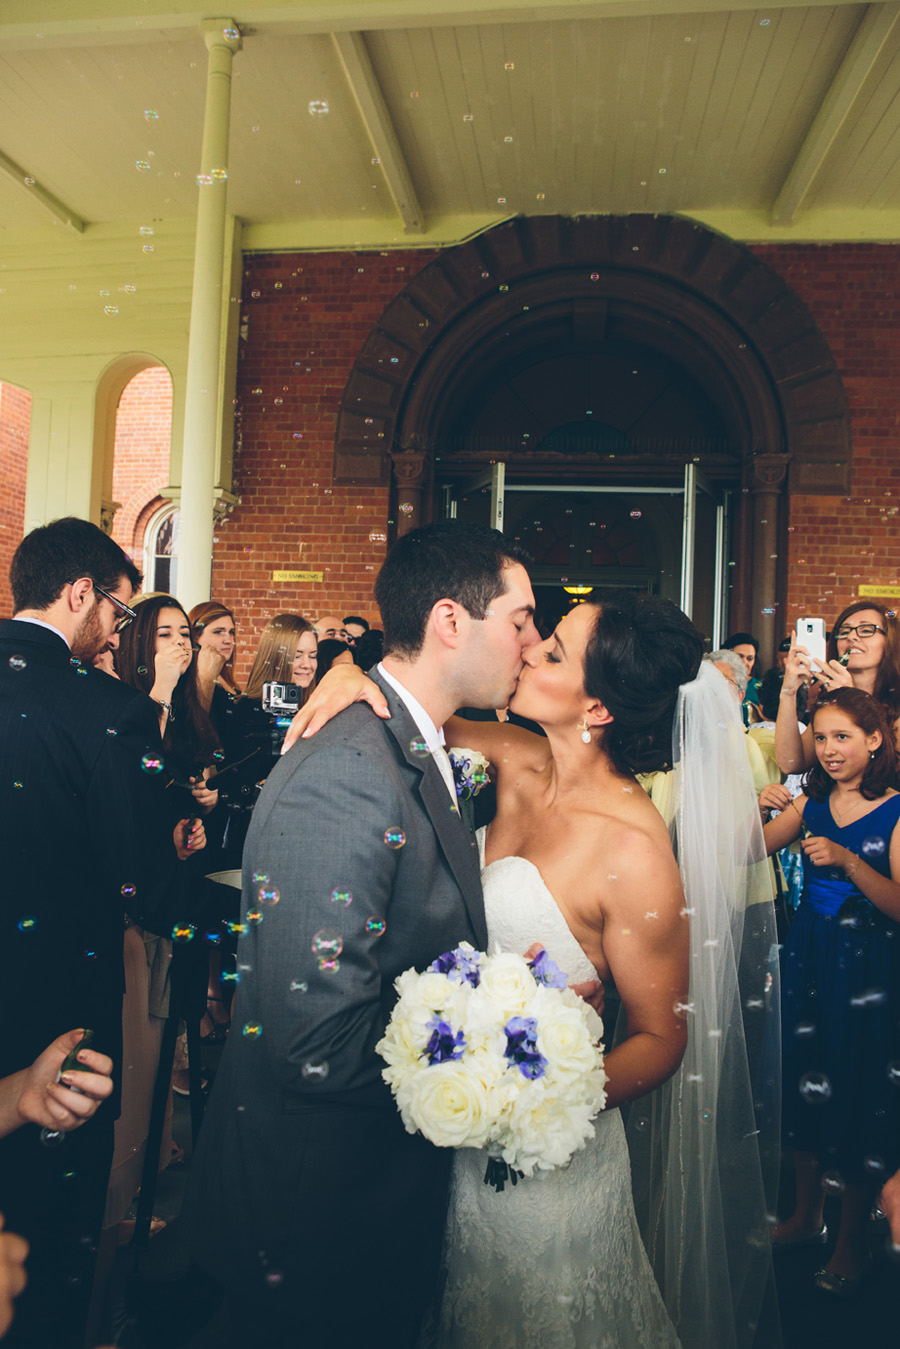 sarajon-nyc-wedding-cynthiachung-blog-0016